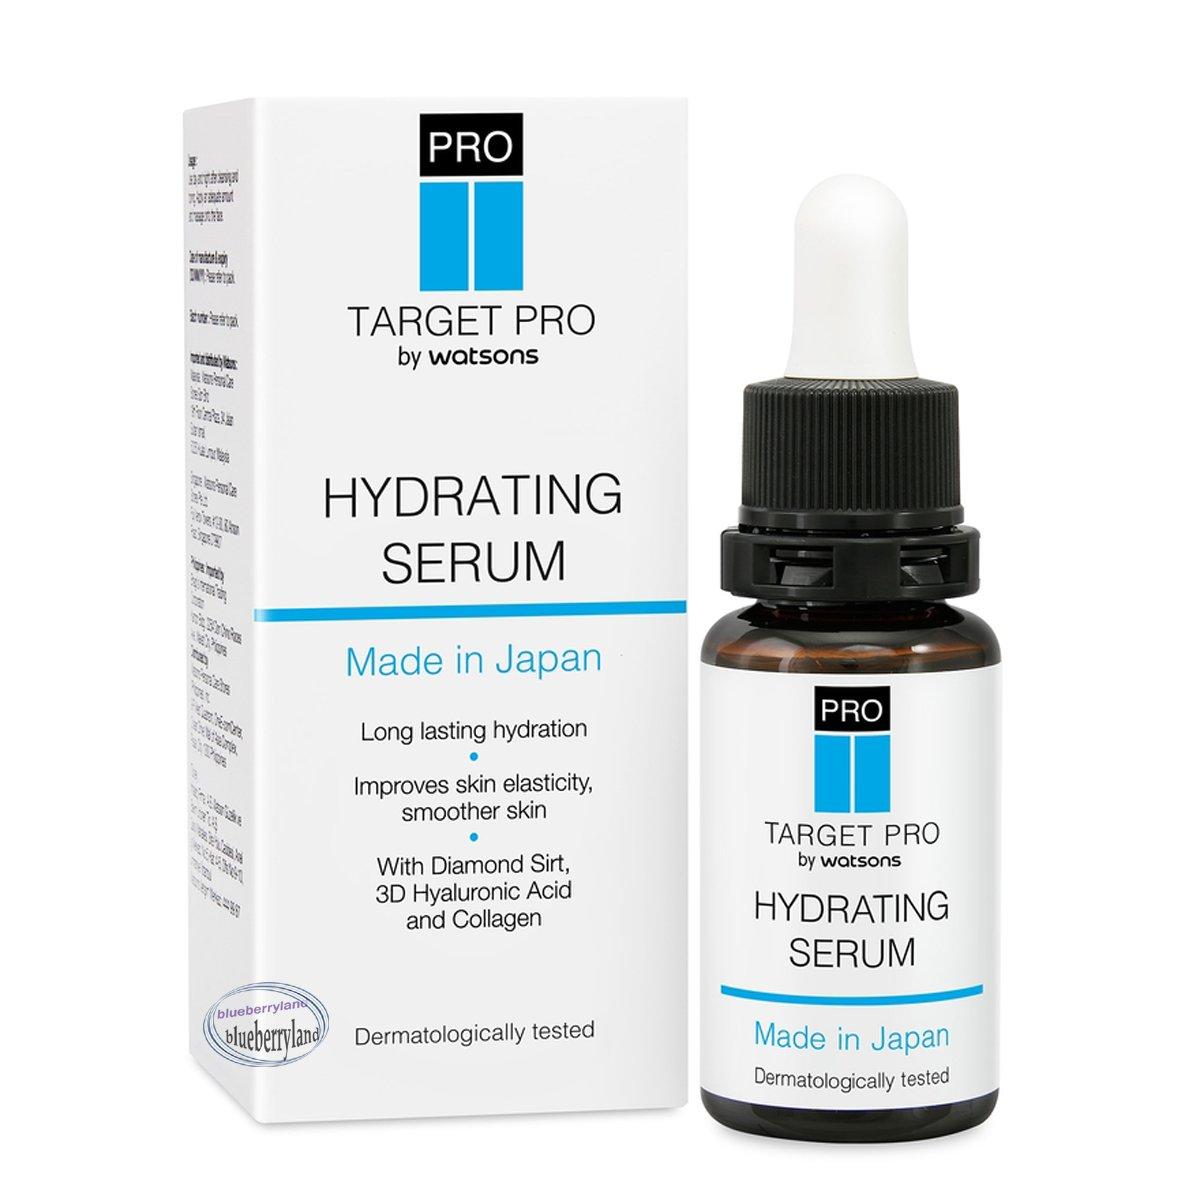 Target Pro by Watsons Hydrating Serum 30ml ladies women  skin care beauty